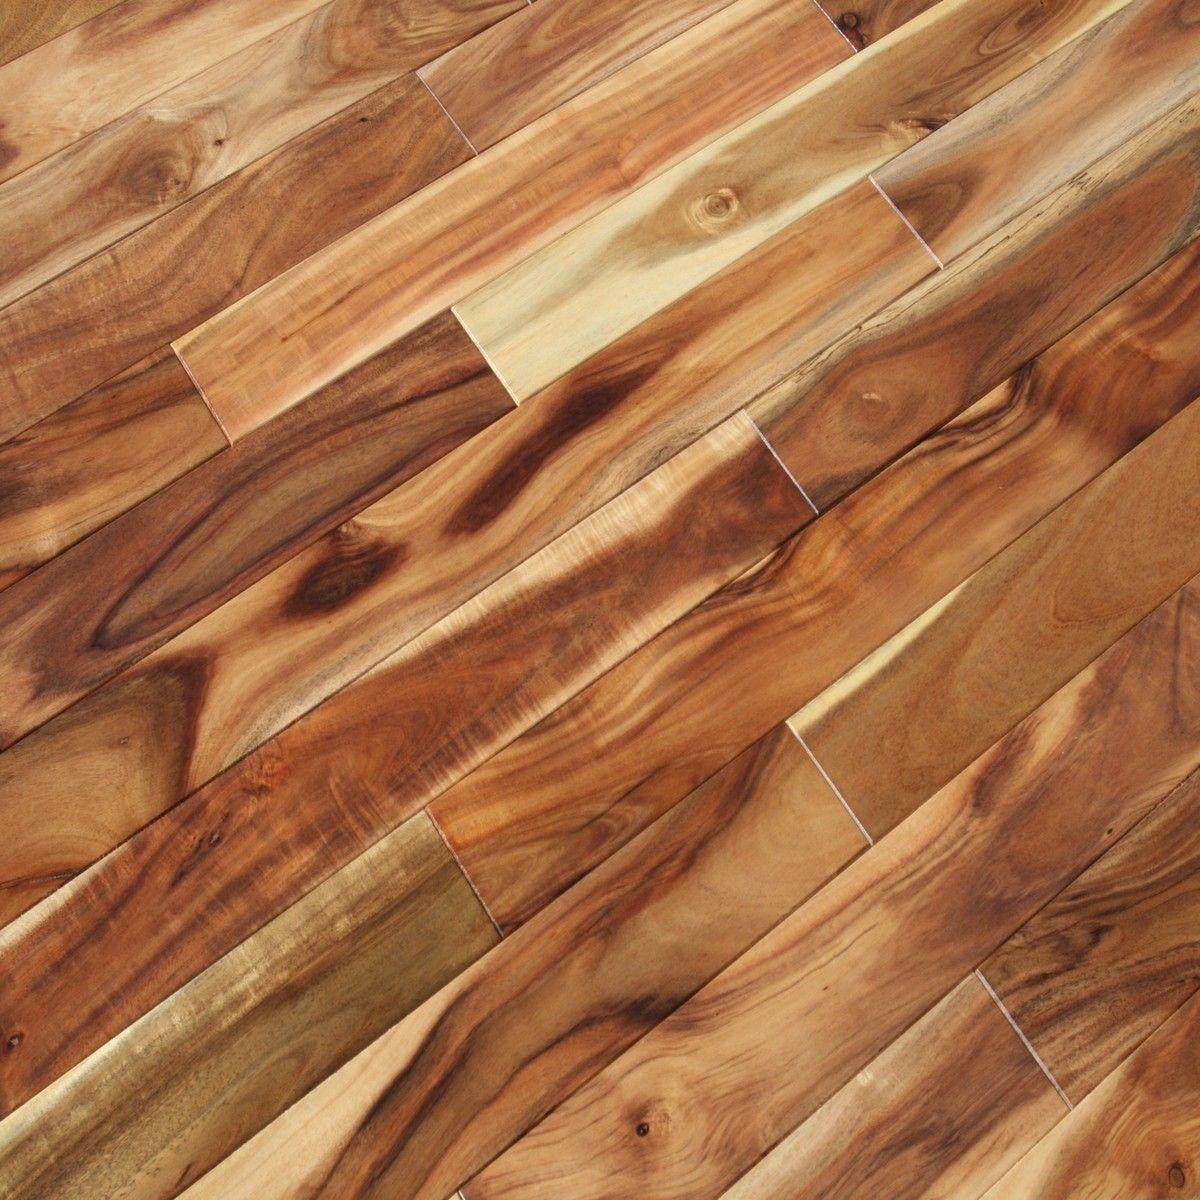 Acacia Asian Walnut Blonde Hardwood Flooring